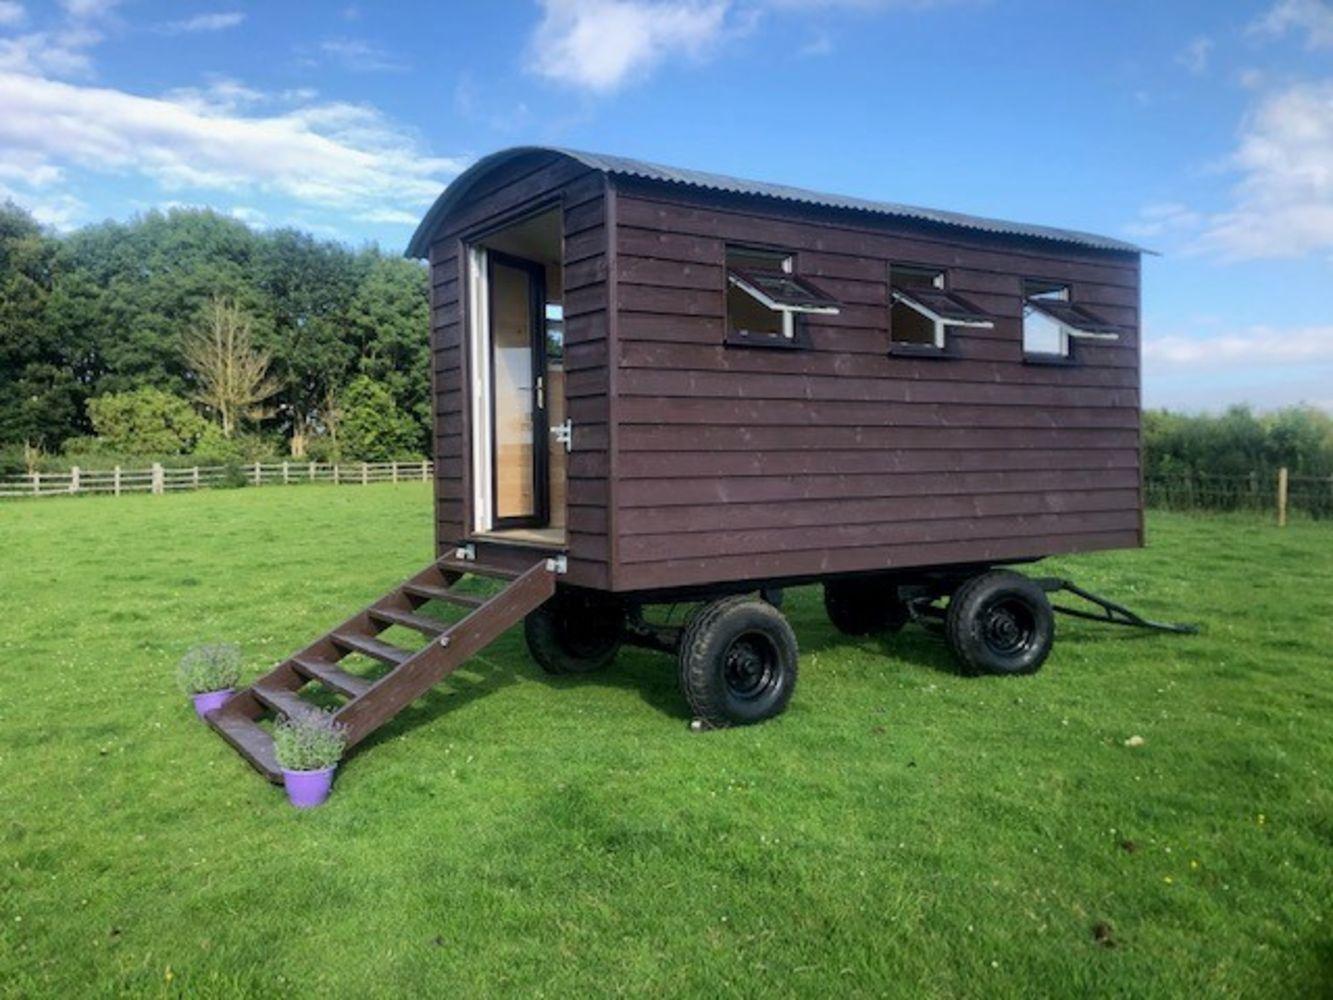 Shepherds Hut Mobile Garden Room or Home office, Glamping, Airbnb, etc. Buyers Premium 12% inclusive of VAT (10%+VAT)